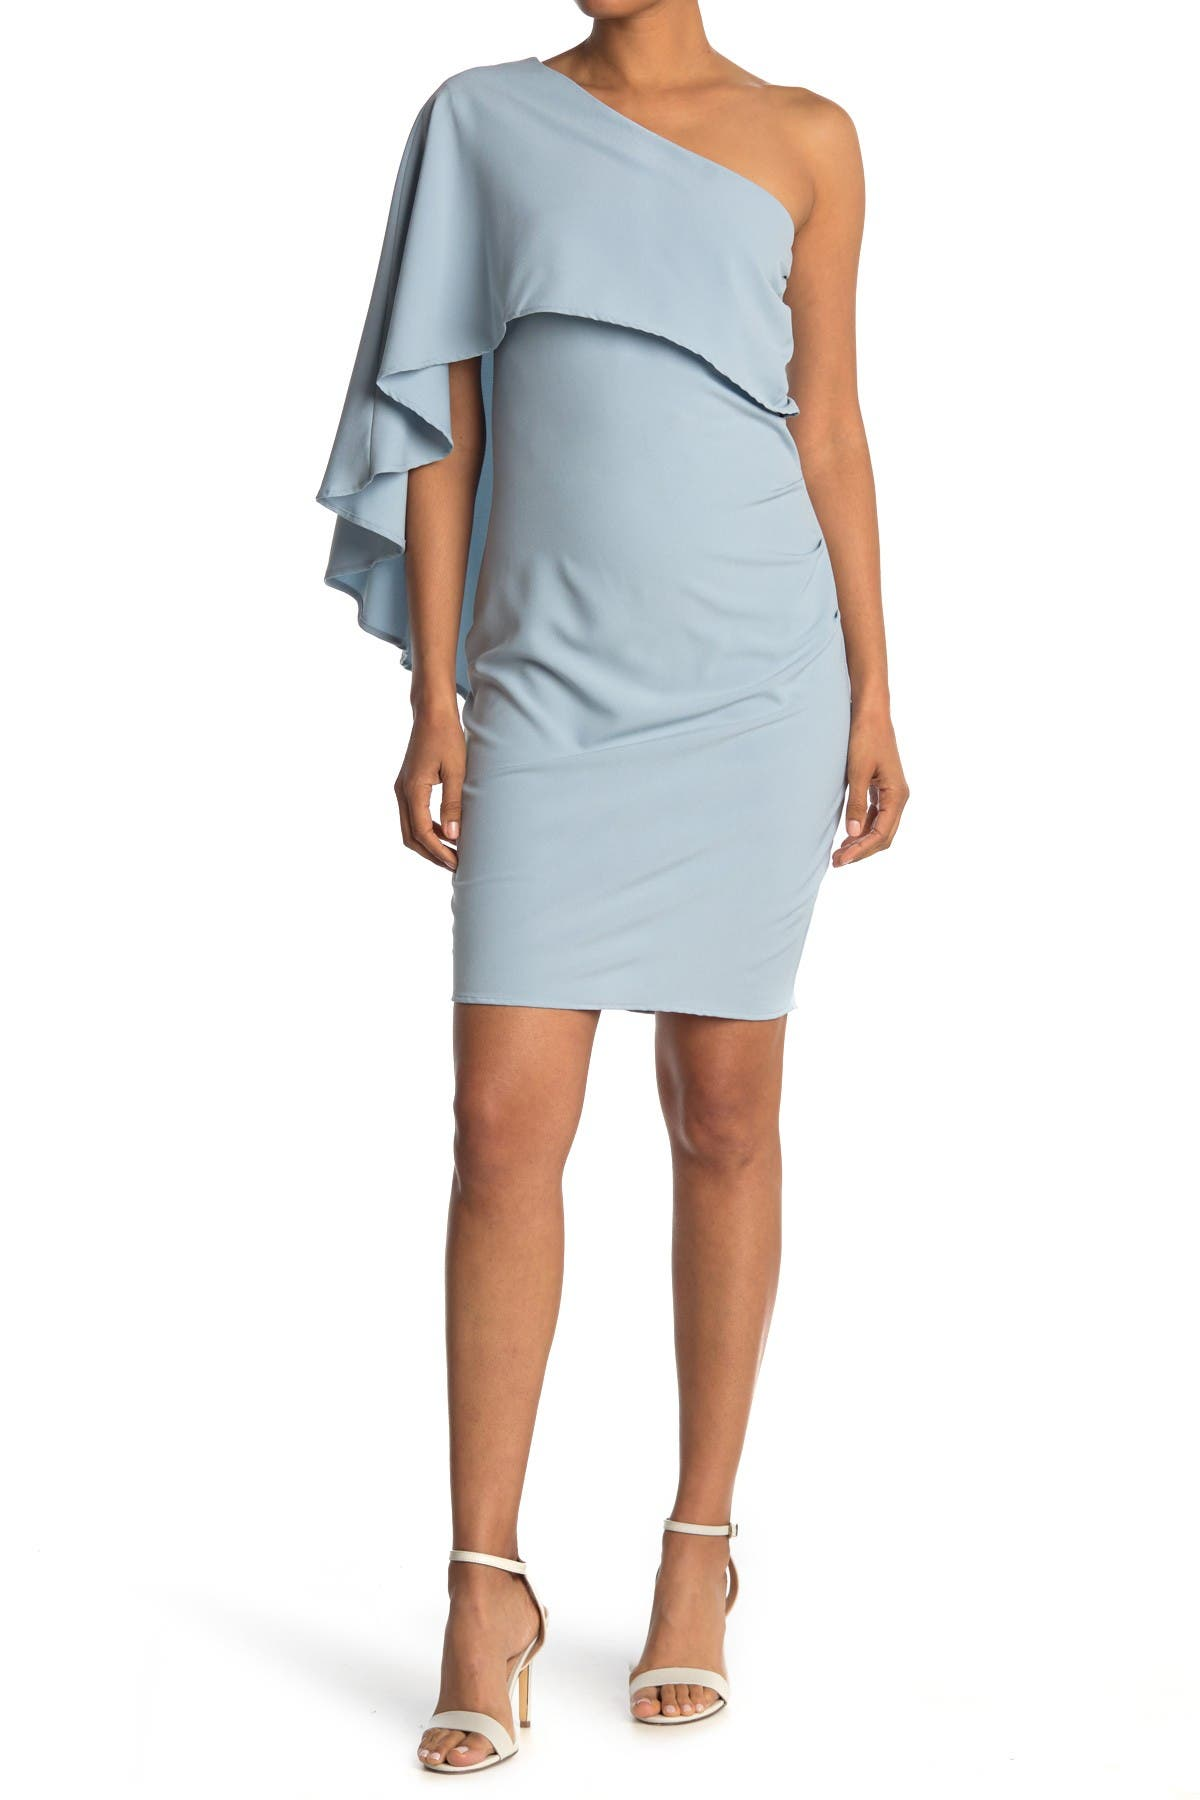 Image of ONE ONE SIX One Shoulder Mini Dress